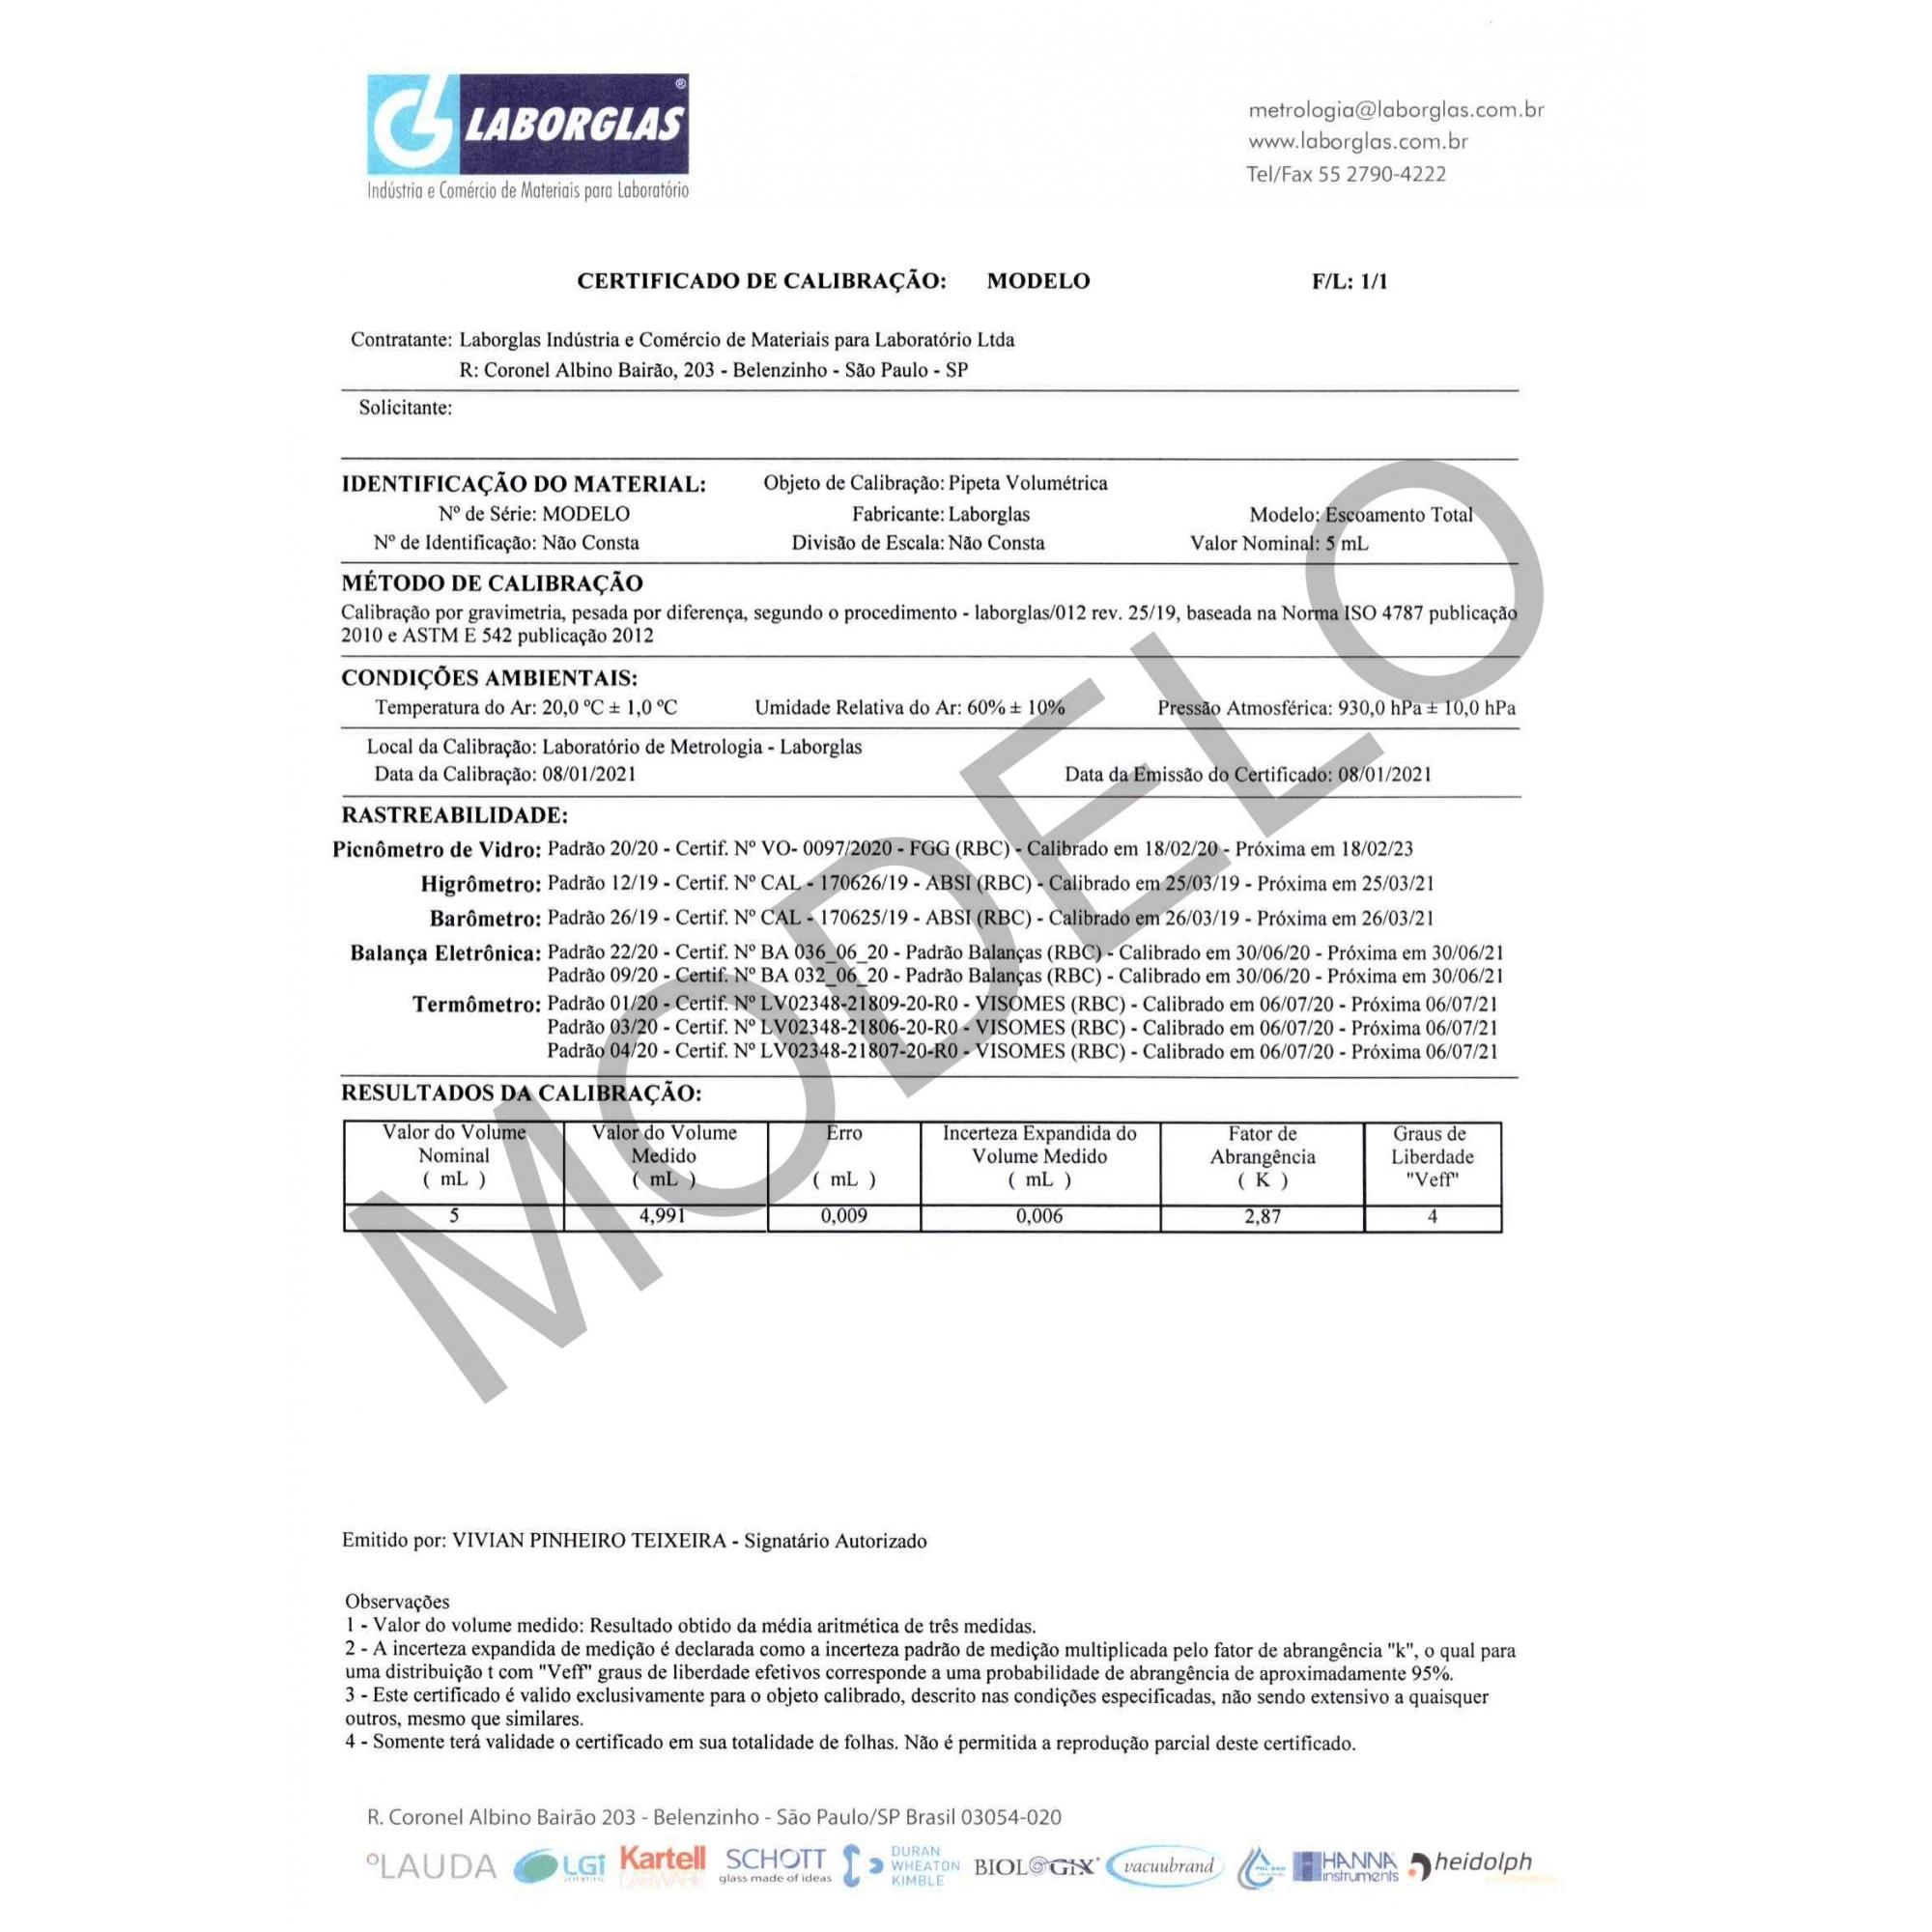 PIPETA VOLUMÉTRICA ESGOTAMENTO TOTAL CLASSE A  10 ML COM CERTIFICADO RASTREÁVEL - Laborglas - Cód. 9433811-C